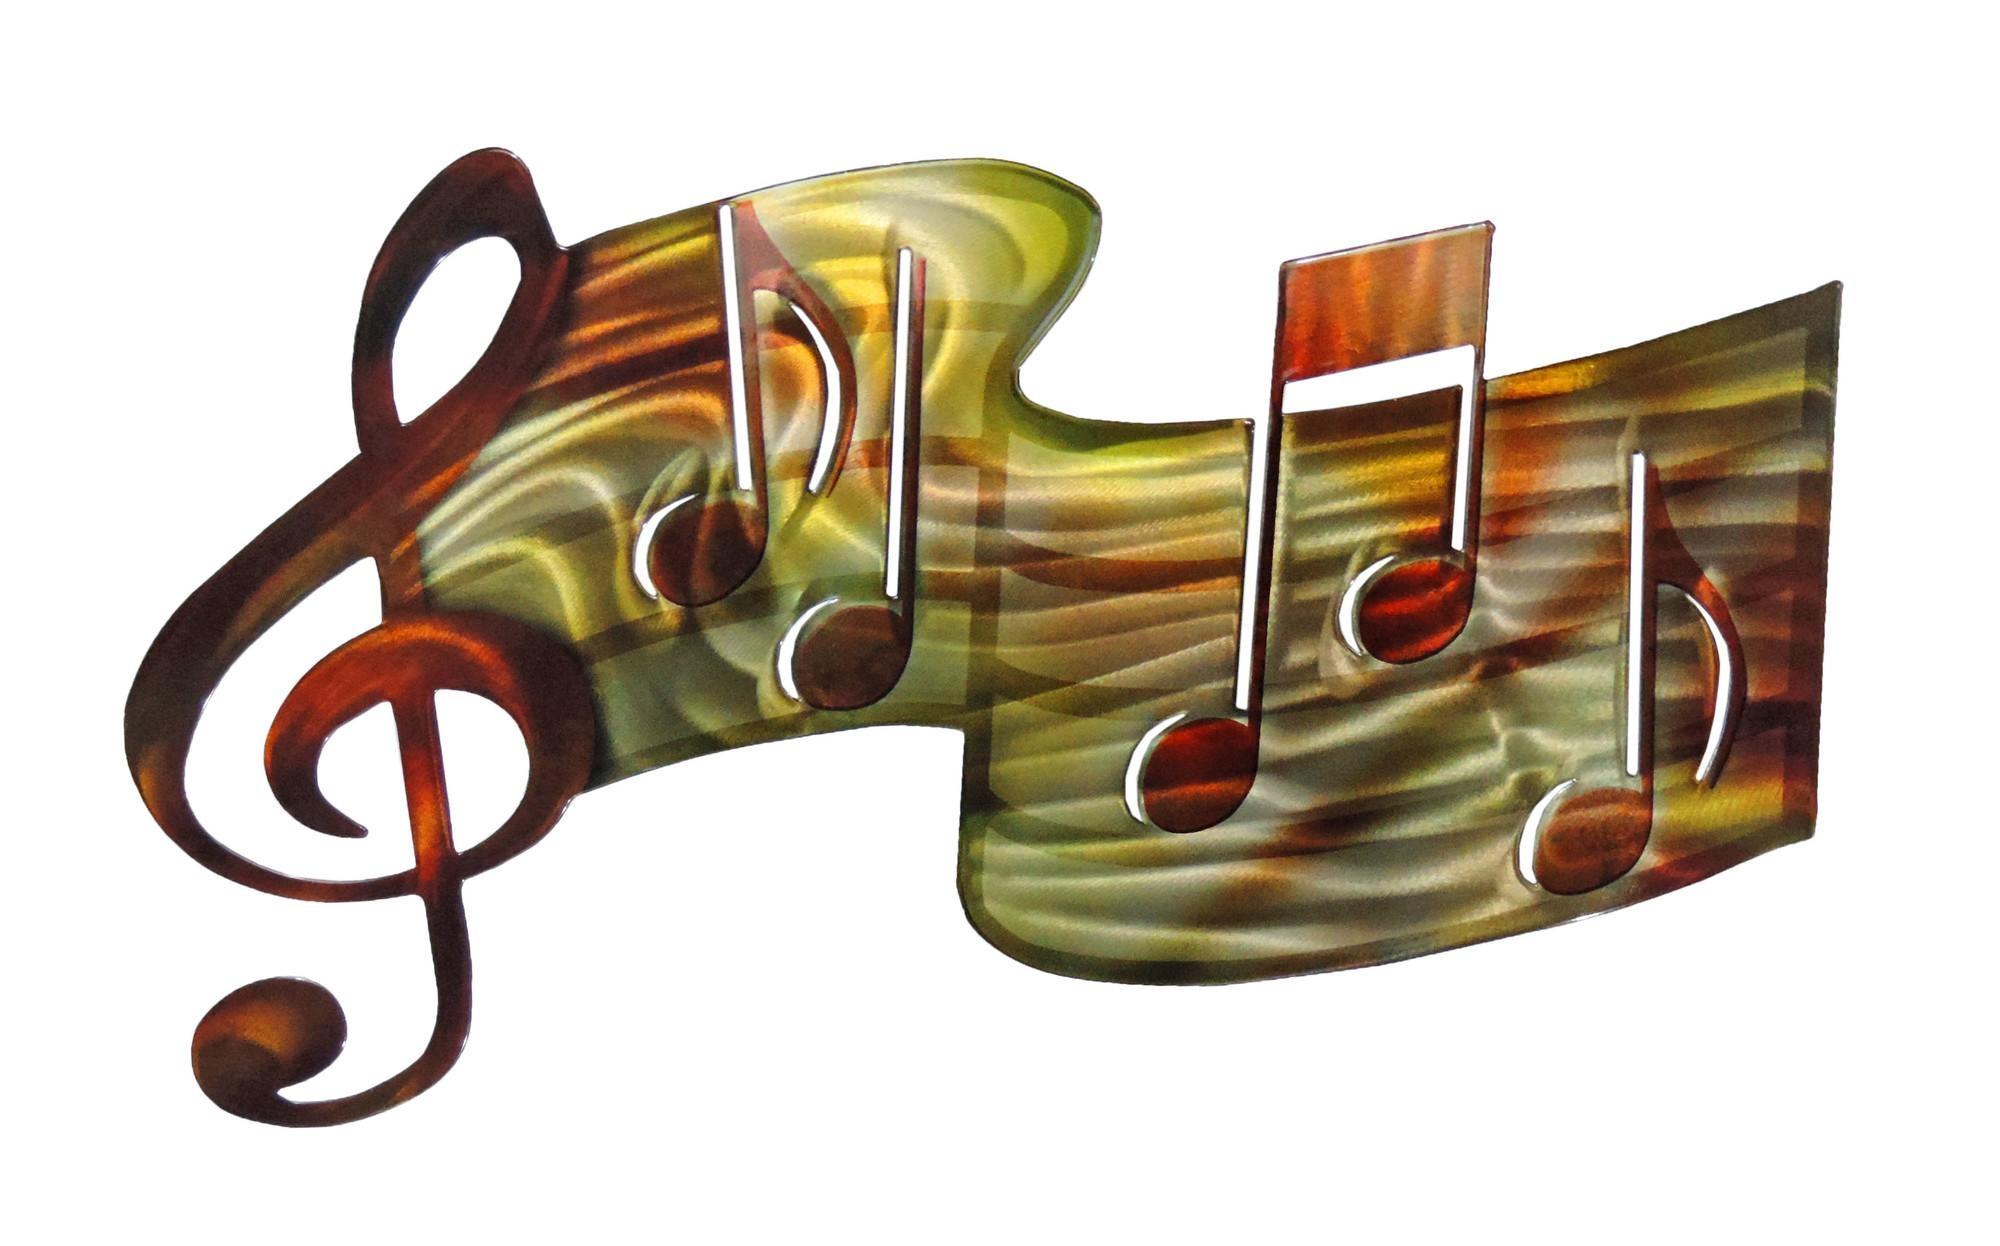 3D Music Staff - Musical Metal Wall Art with regard to Metal Music Wall Art